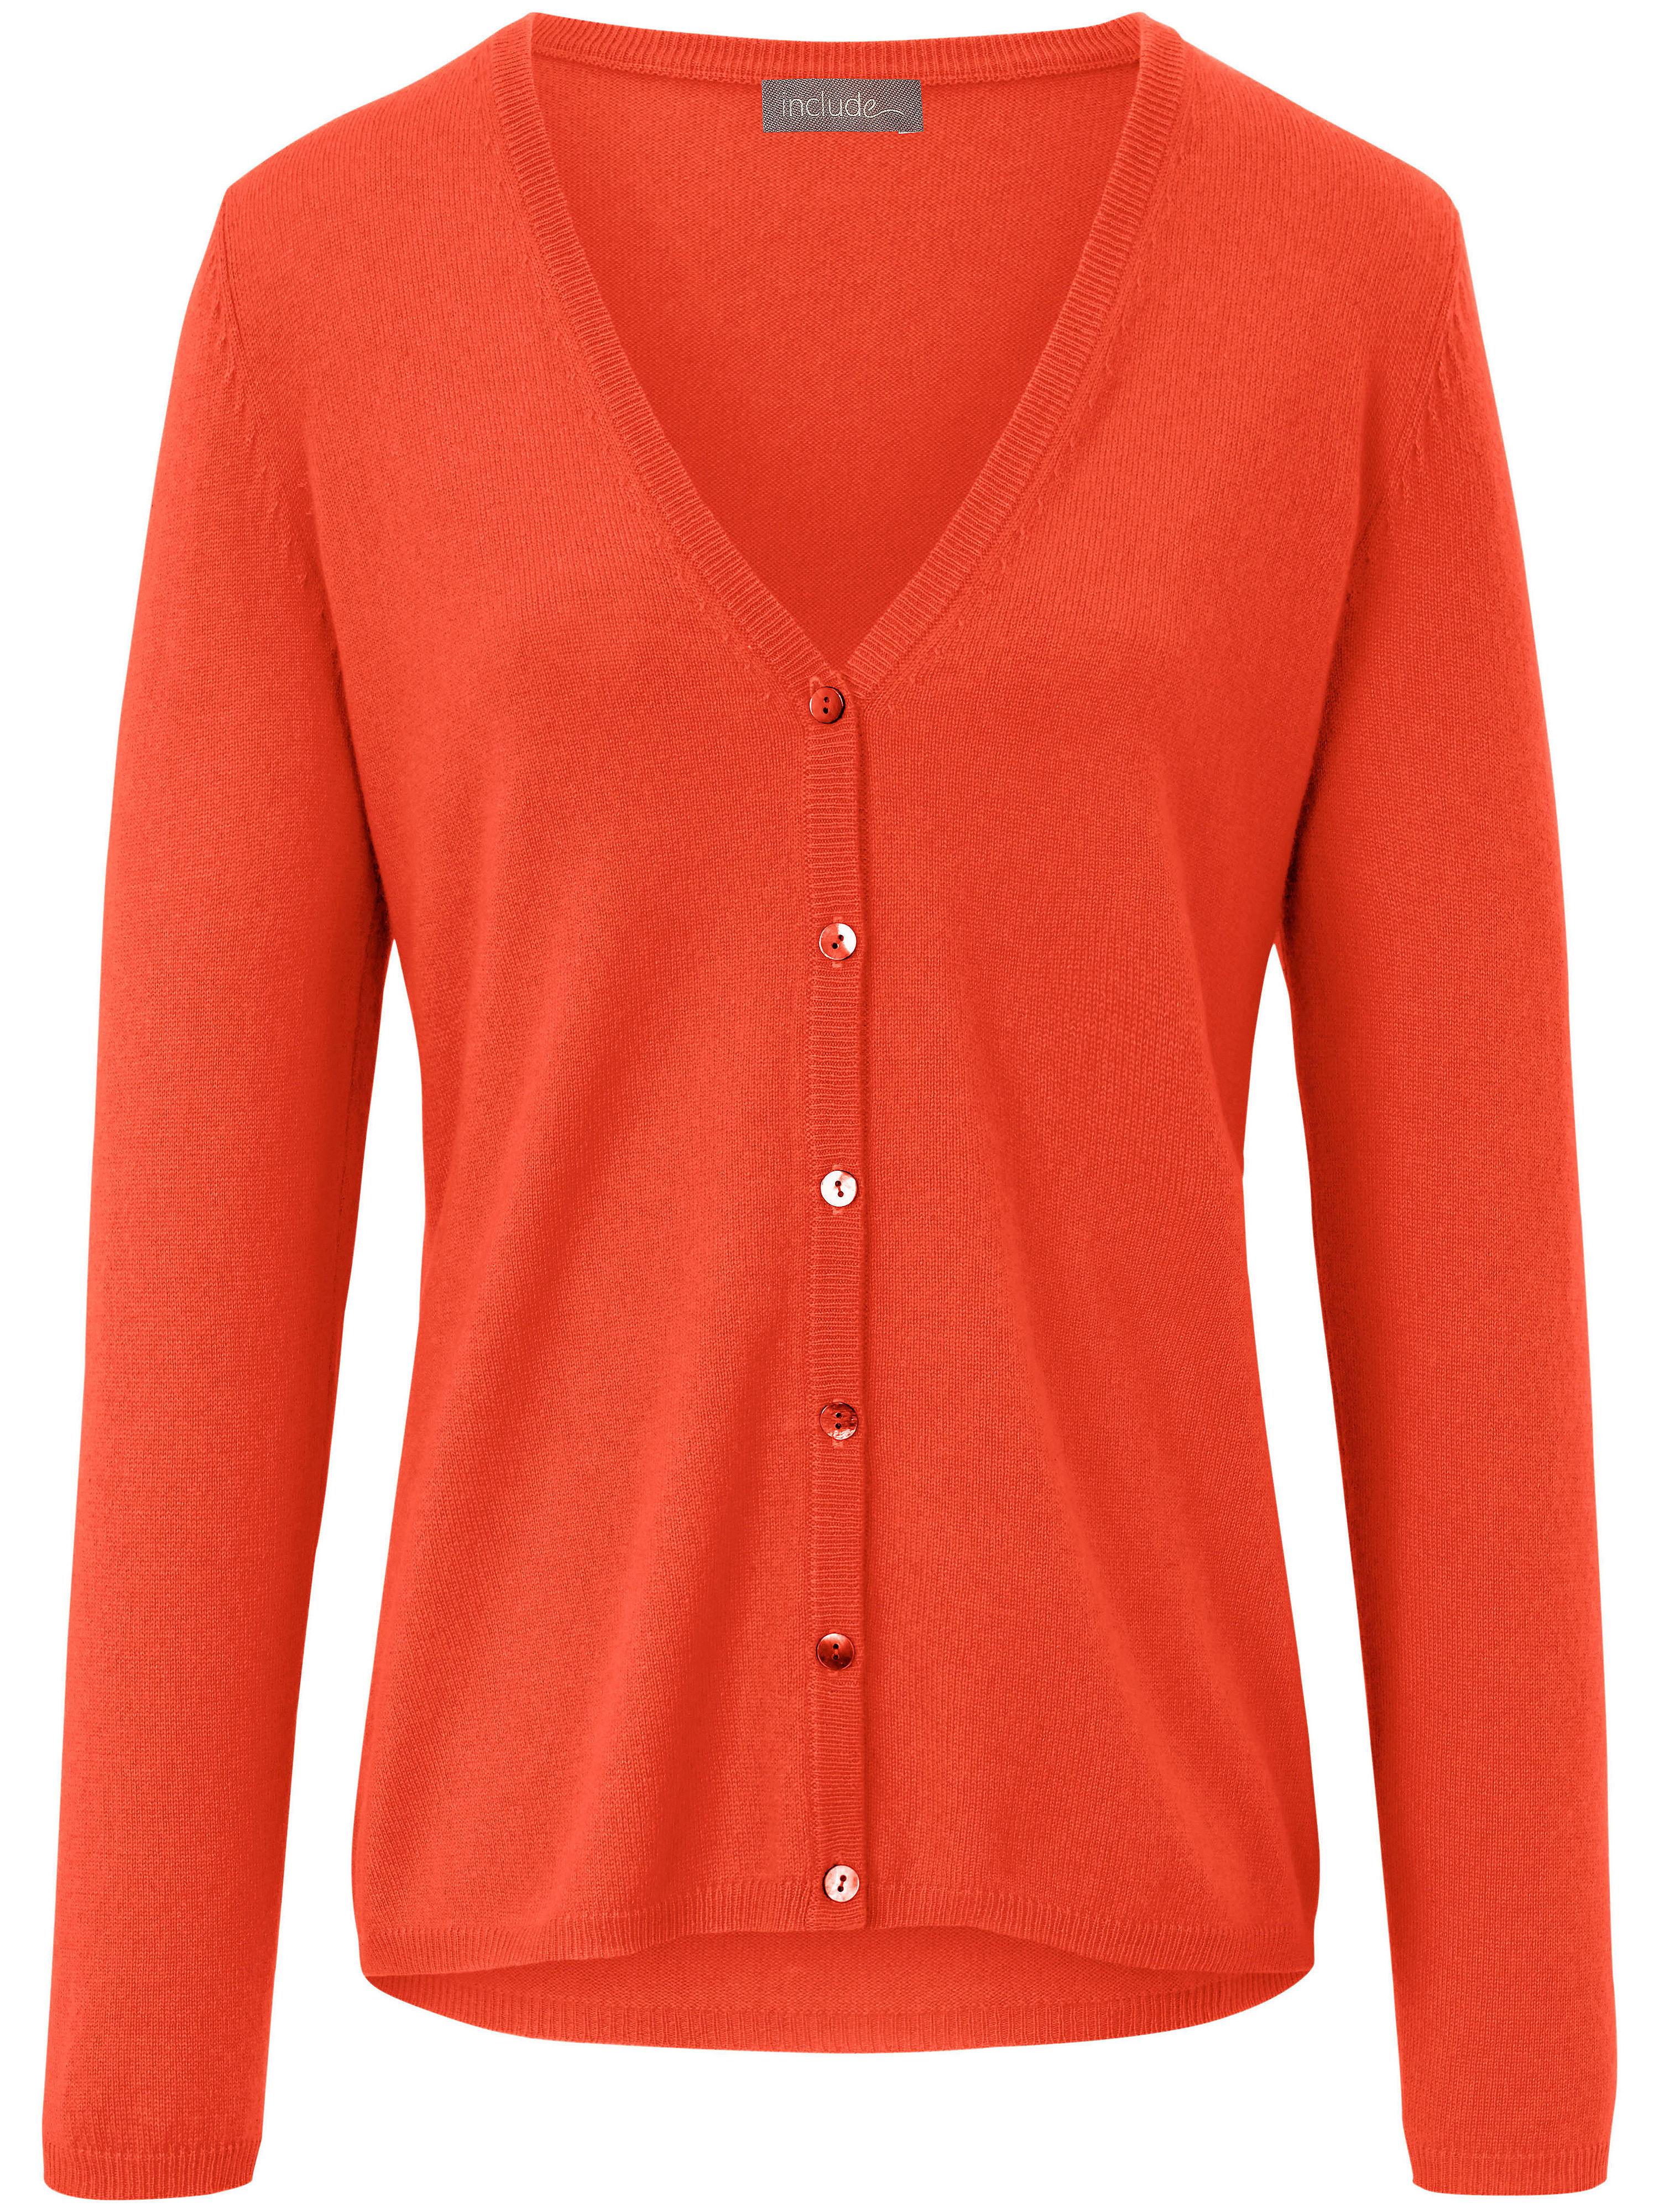 Image of   Cardigan Fra include orange